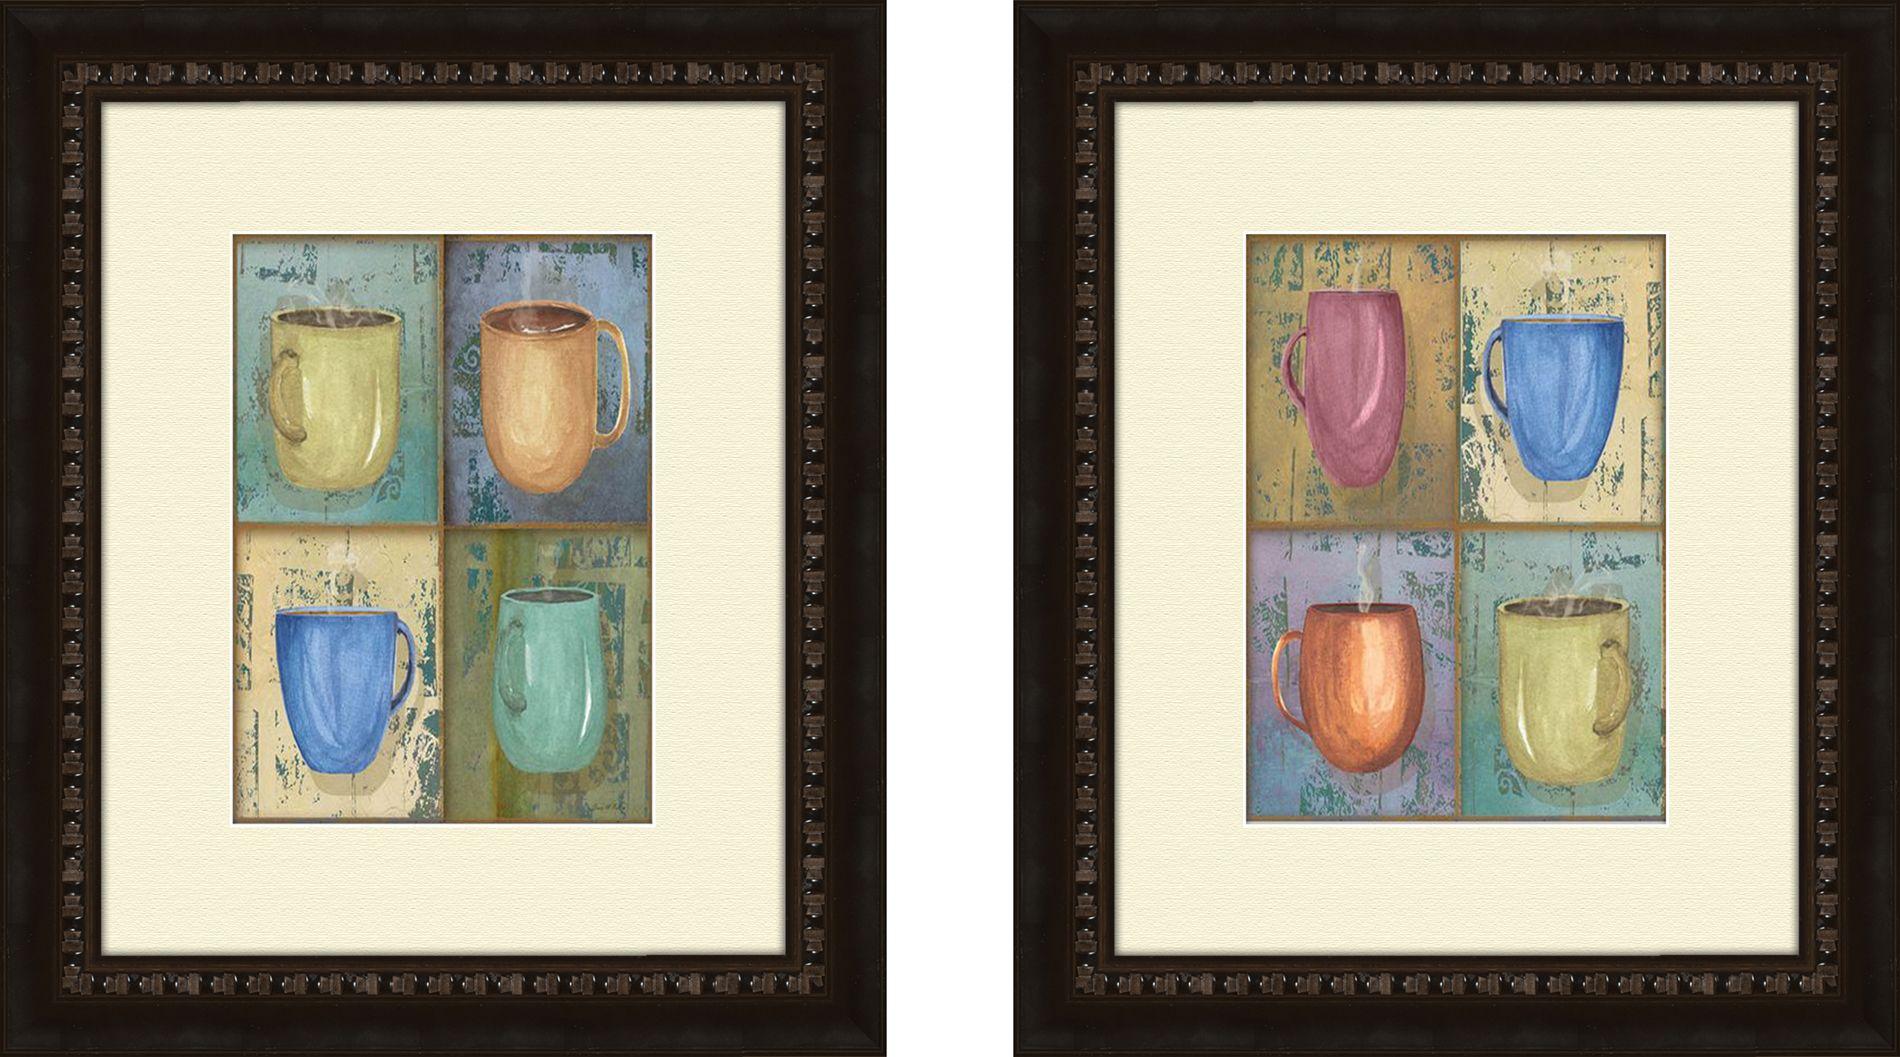 "PTM Images 11.5"" x 13.5"" Cups Wall Art Print PartNumber: 02409441000P KsnValue: 02409441000 MfgPartNumber: 1-6707"